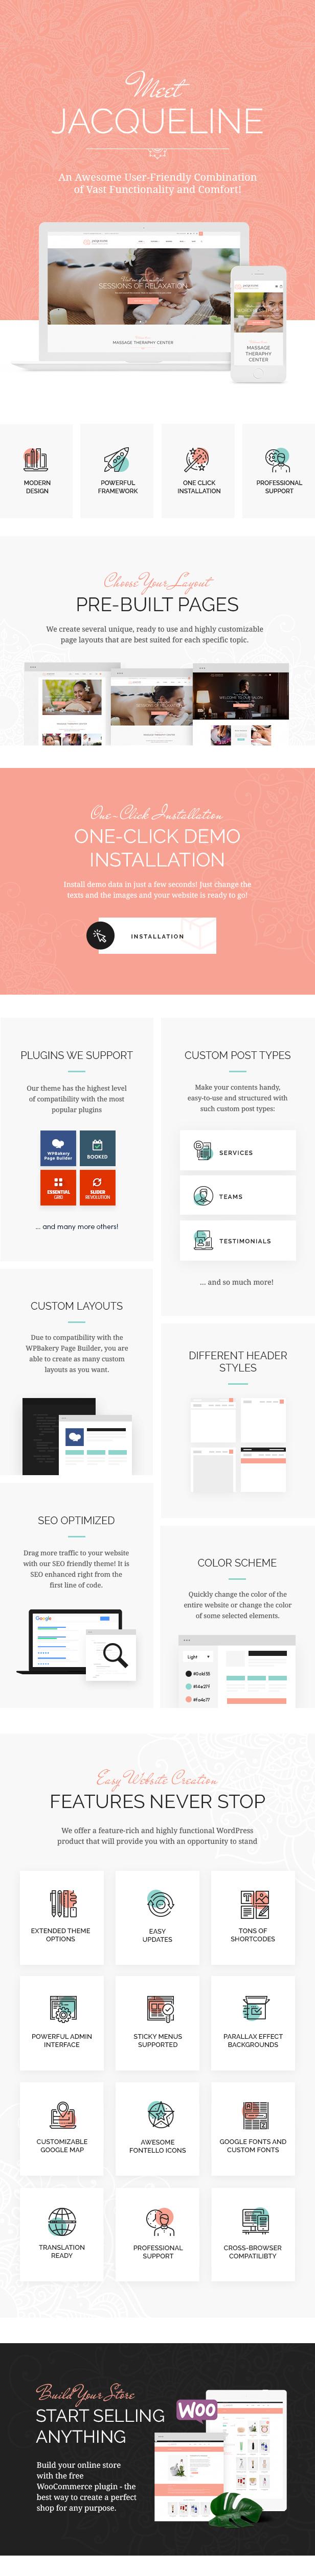 Spa & Massage Salon WordPress Theme features